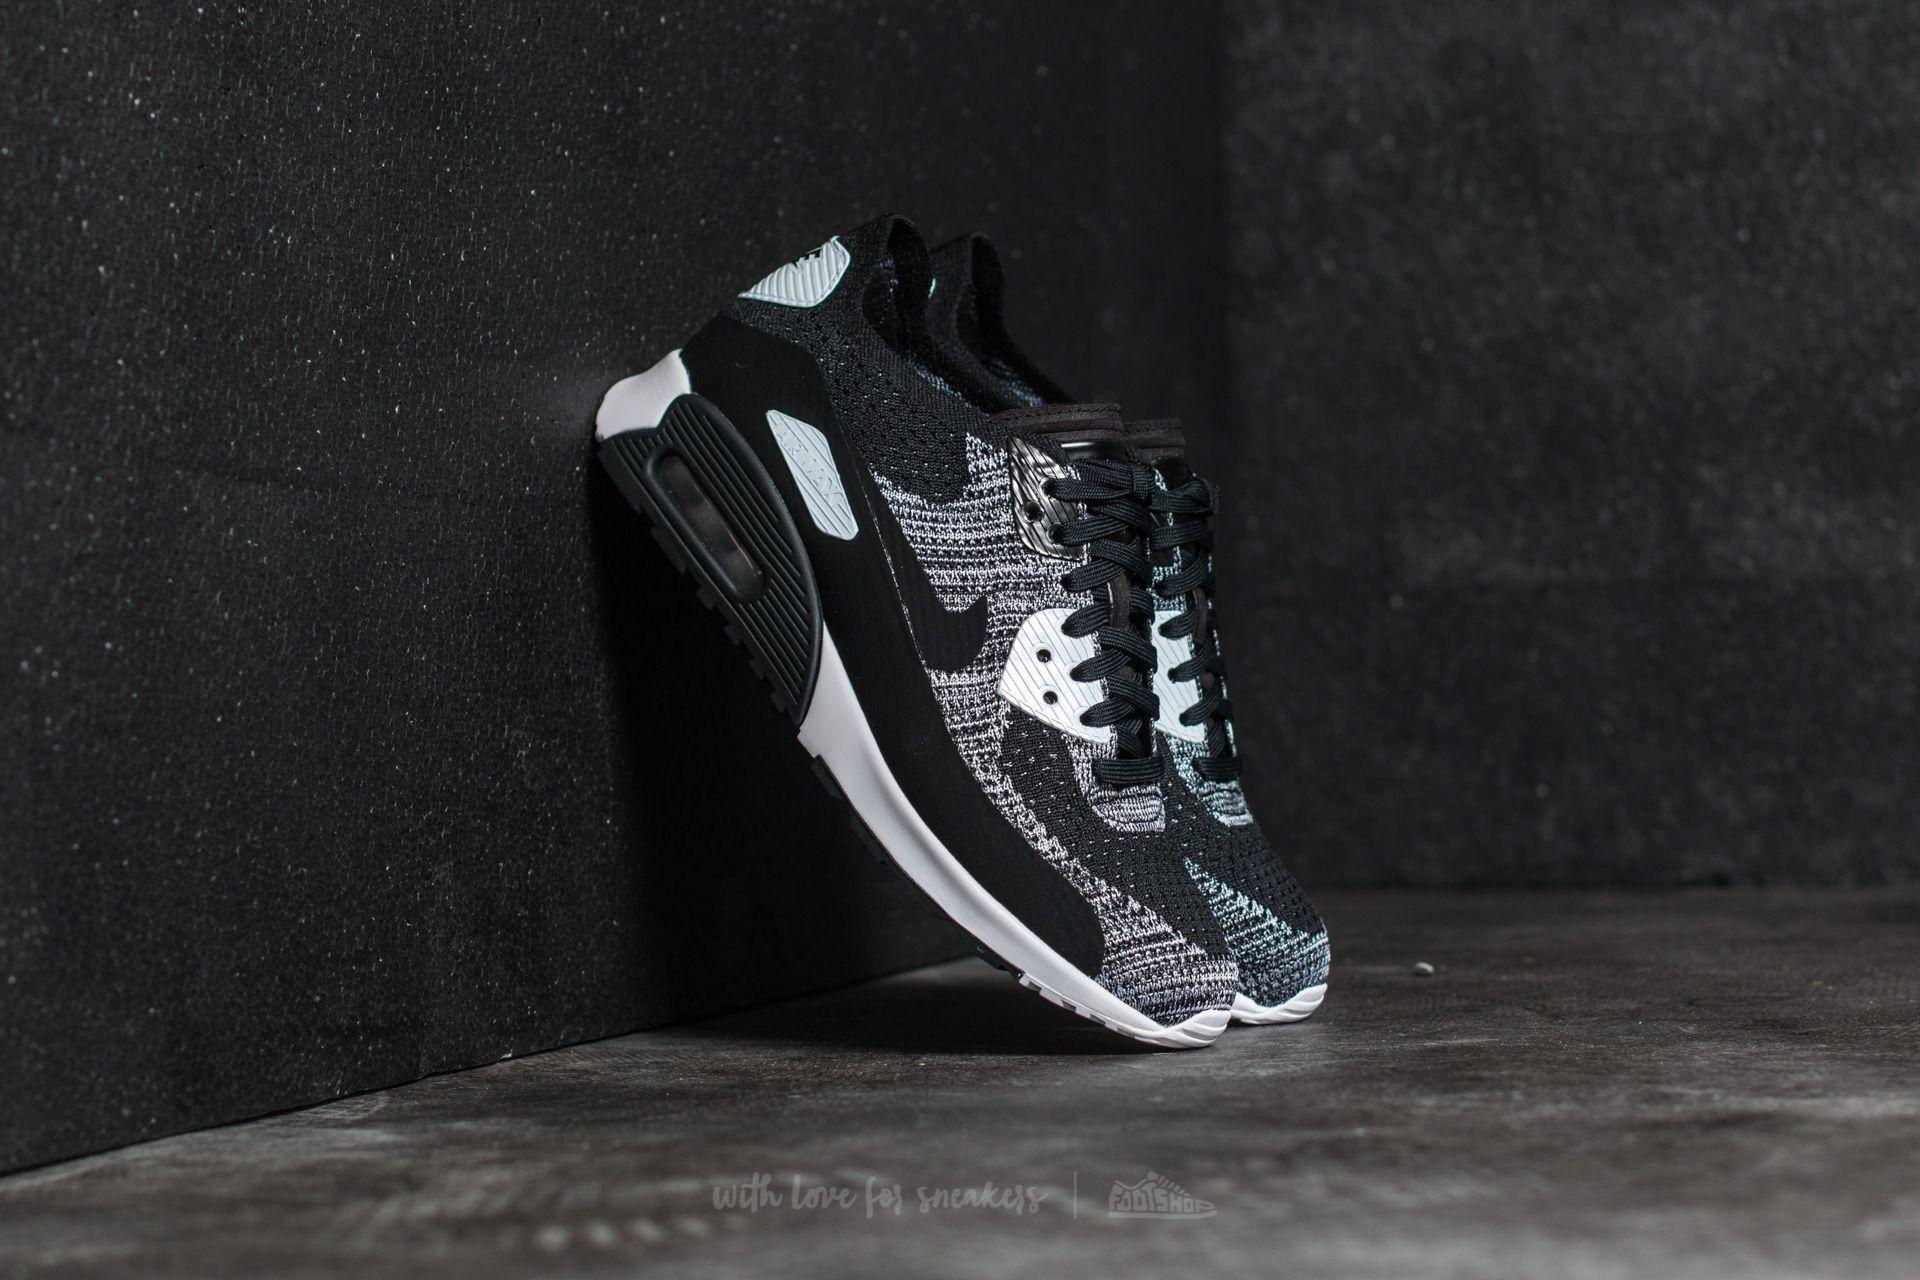 Nike W Air Max 90 Ultra 2.0 Flyknit Black/ Black-White-Anthracite Footshop – FR